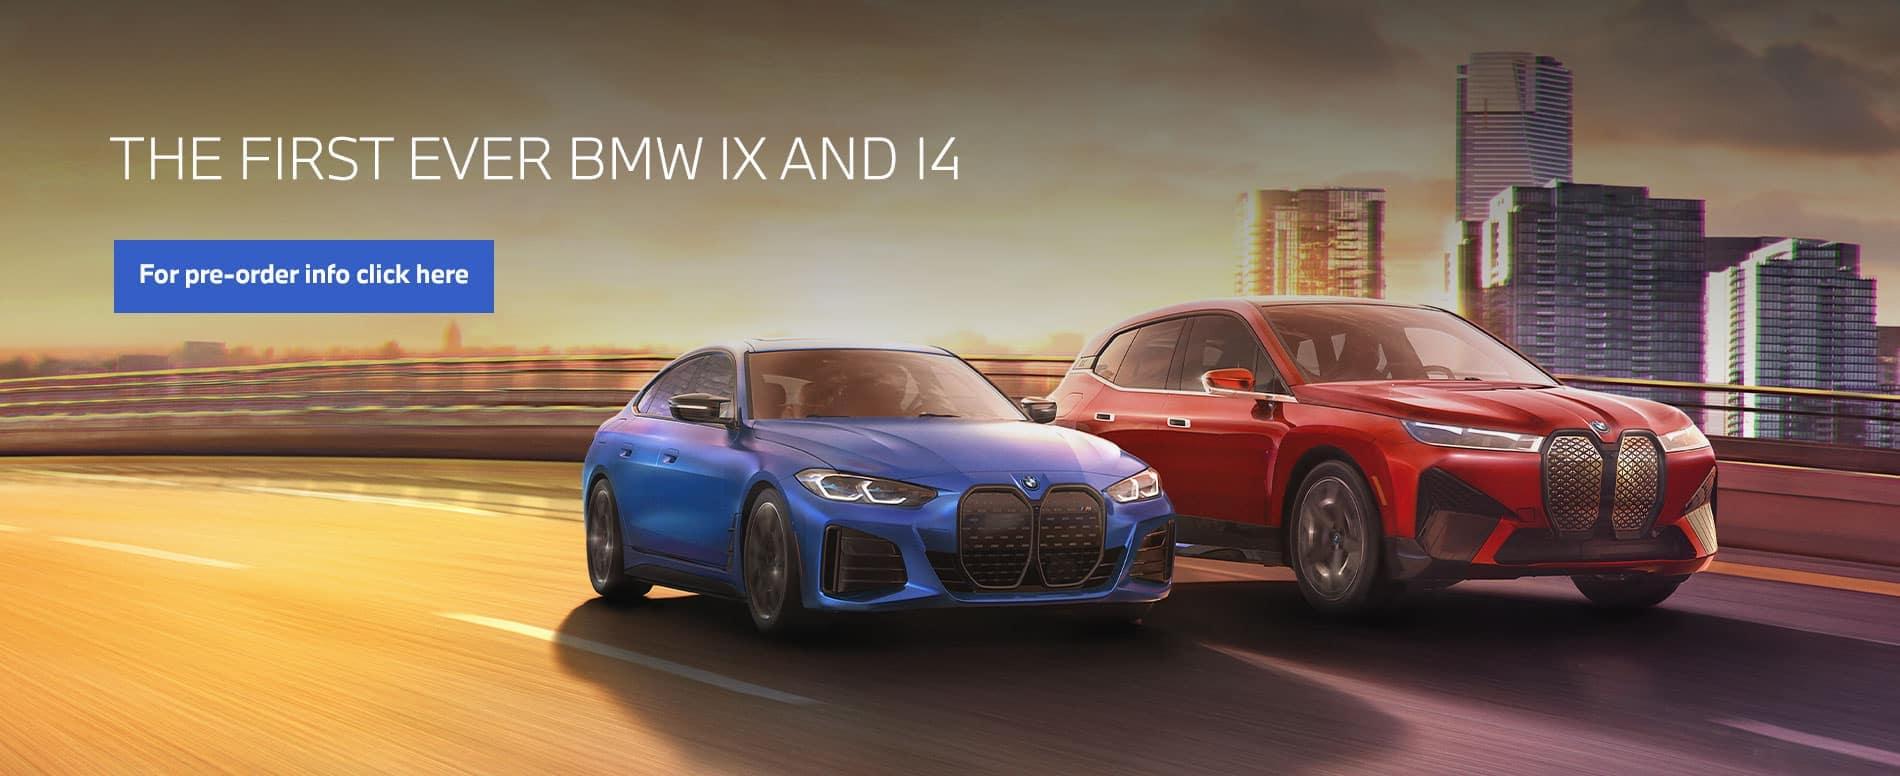 iX and i4